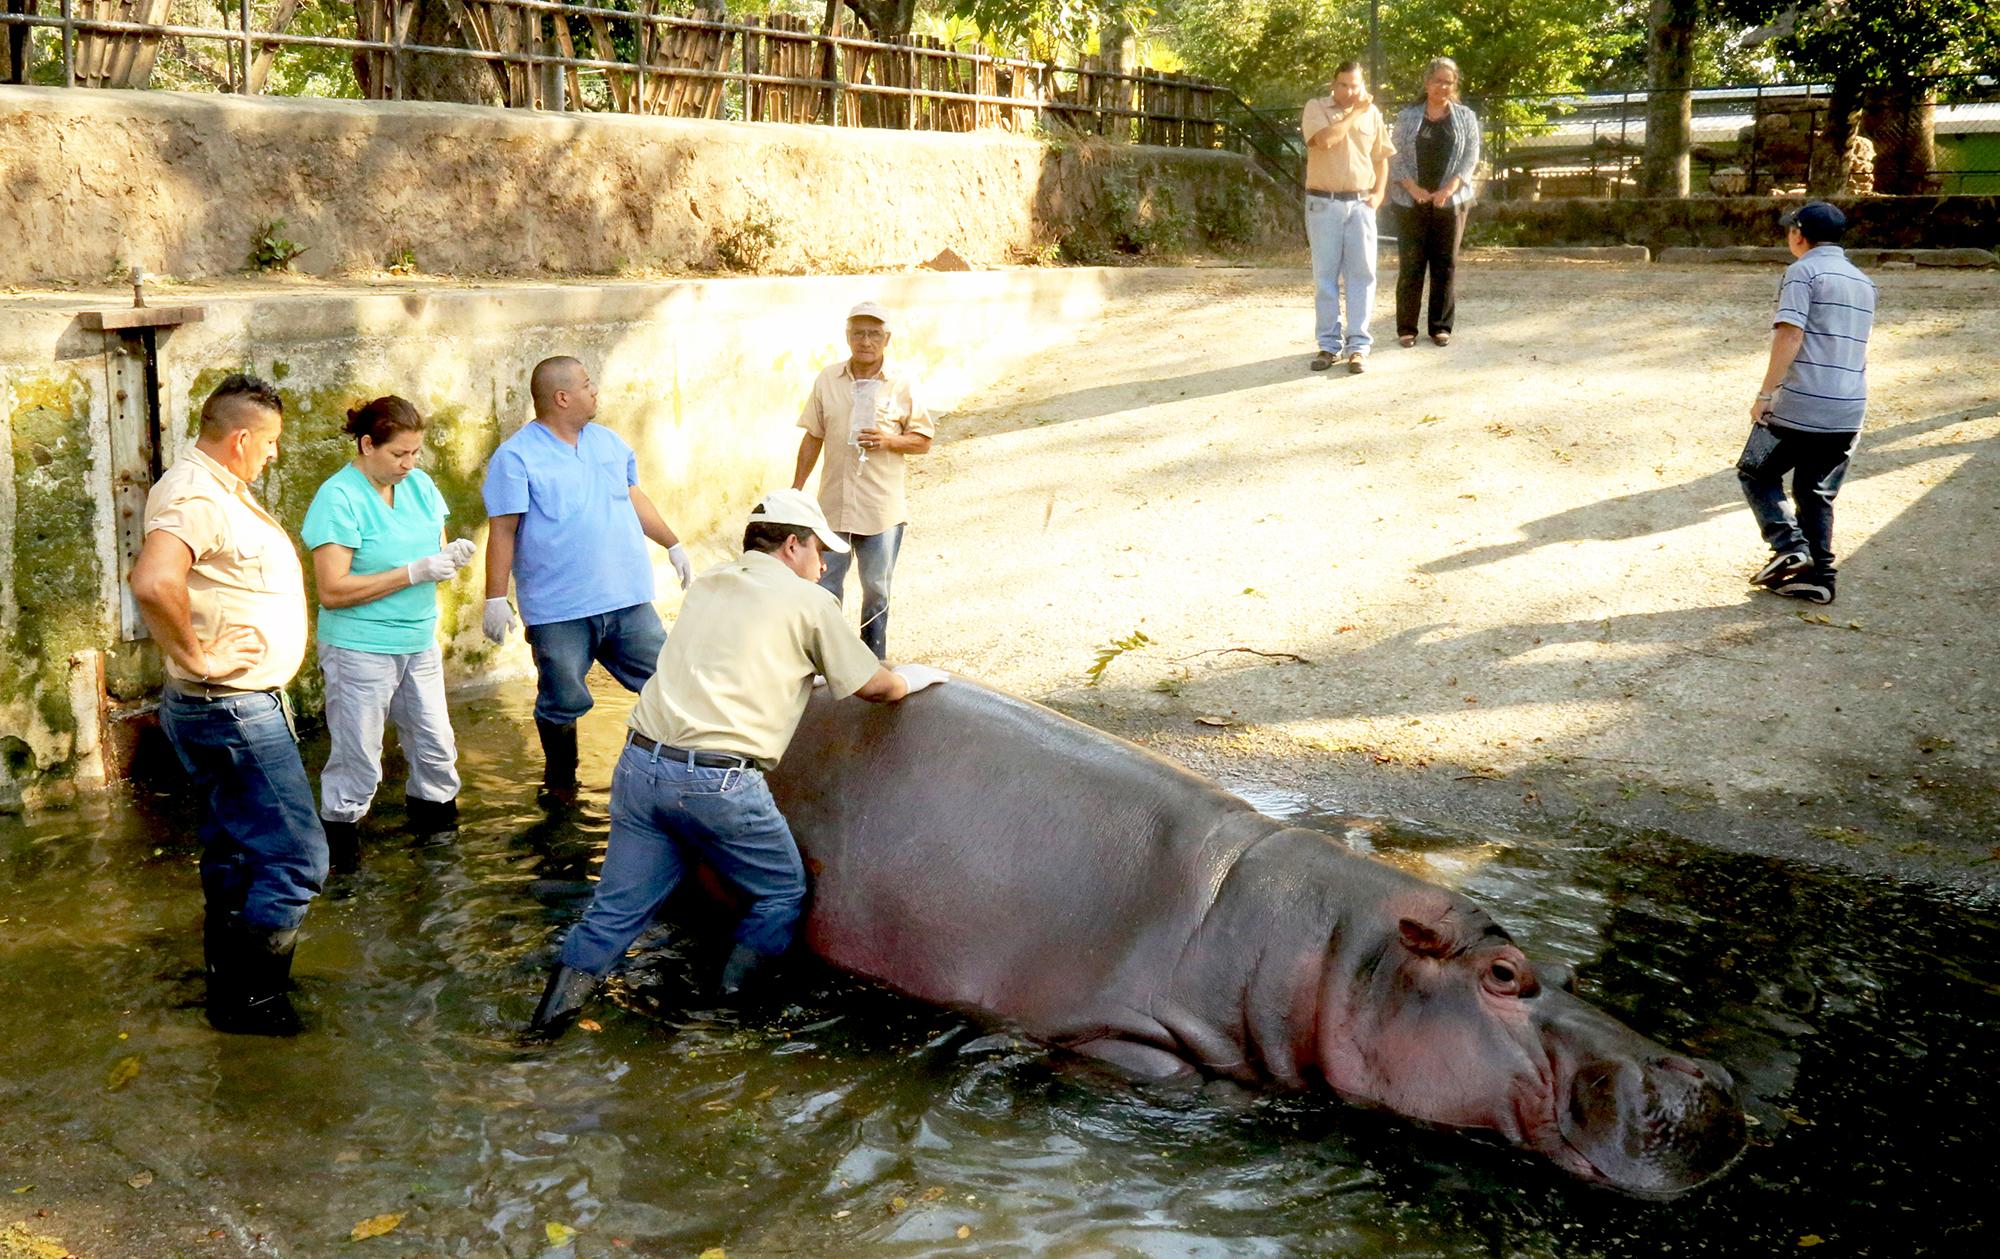 A handout photo made available by El Salvador's Culture Ministry shows El Salvador National Zoo personnel attending to a hippopotamus named Gustavito in San Salvador, El Salvador on Feb. 25 2017.